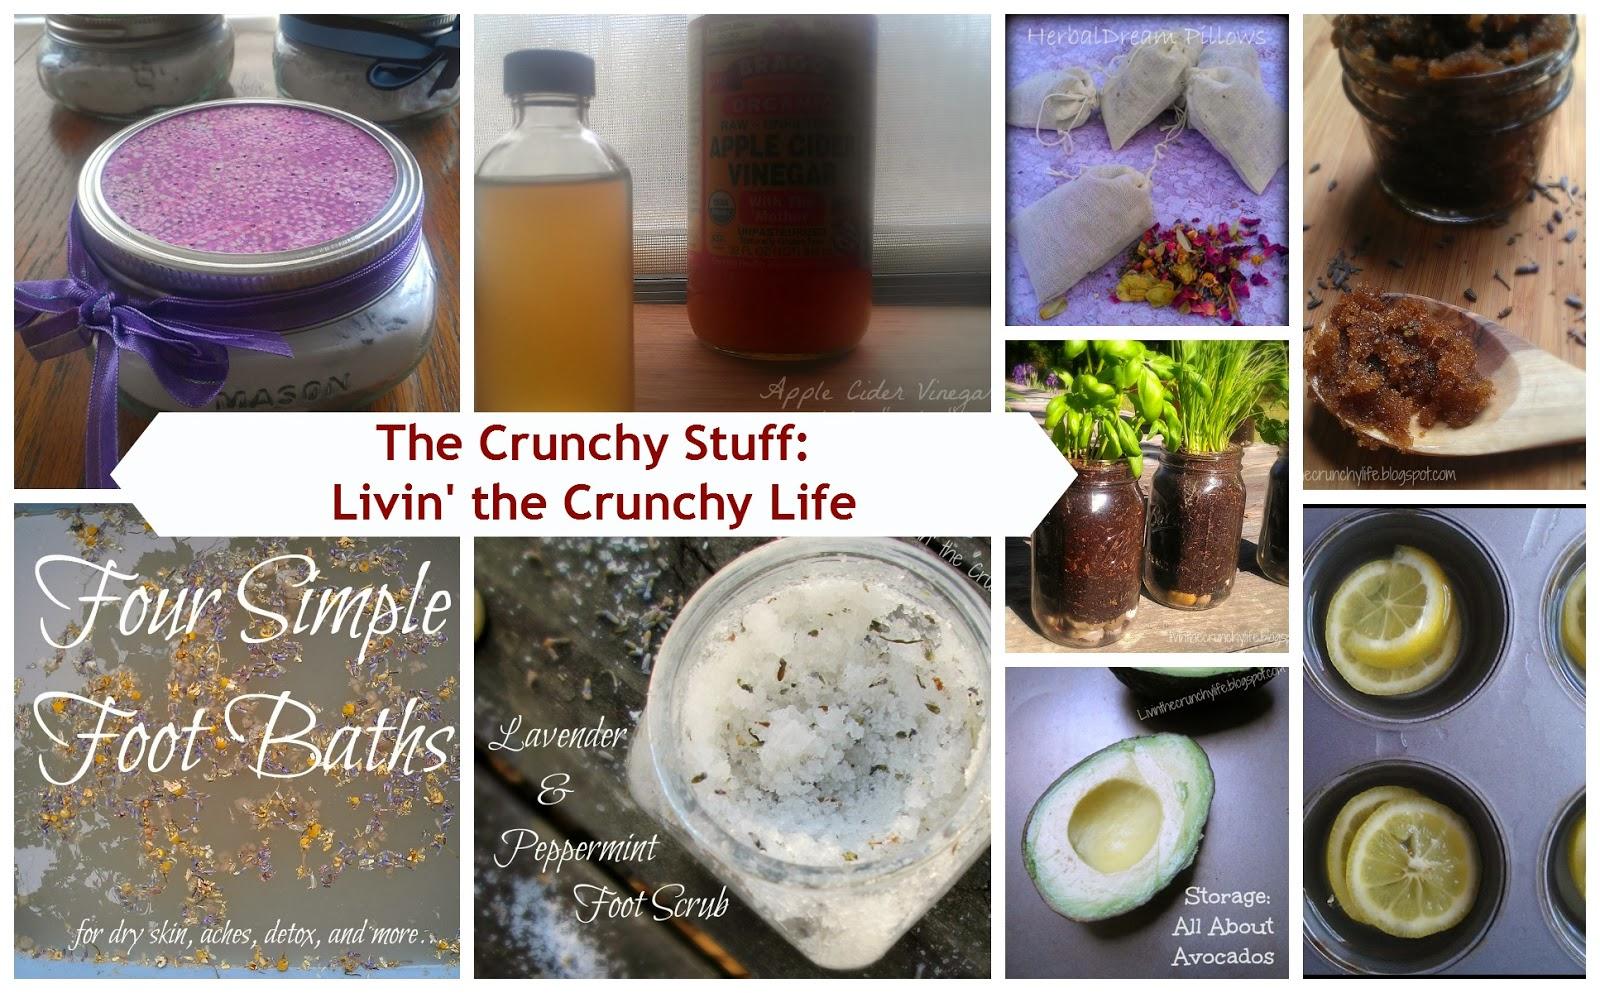 The Crunchy Stuff: Livin' the Crunchy Life